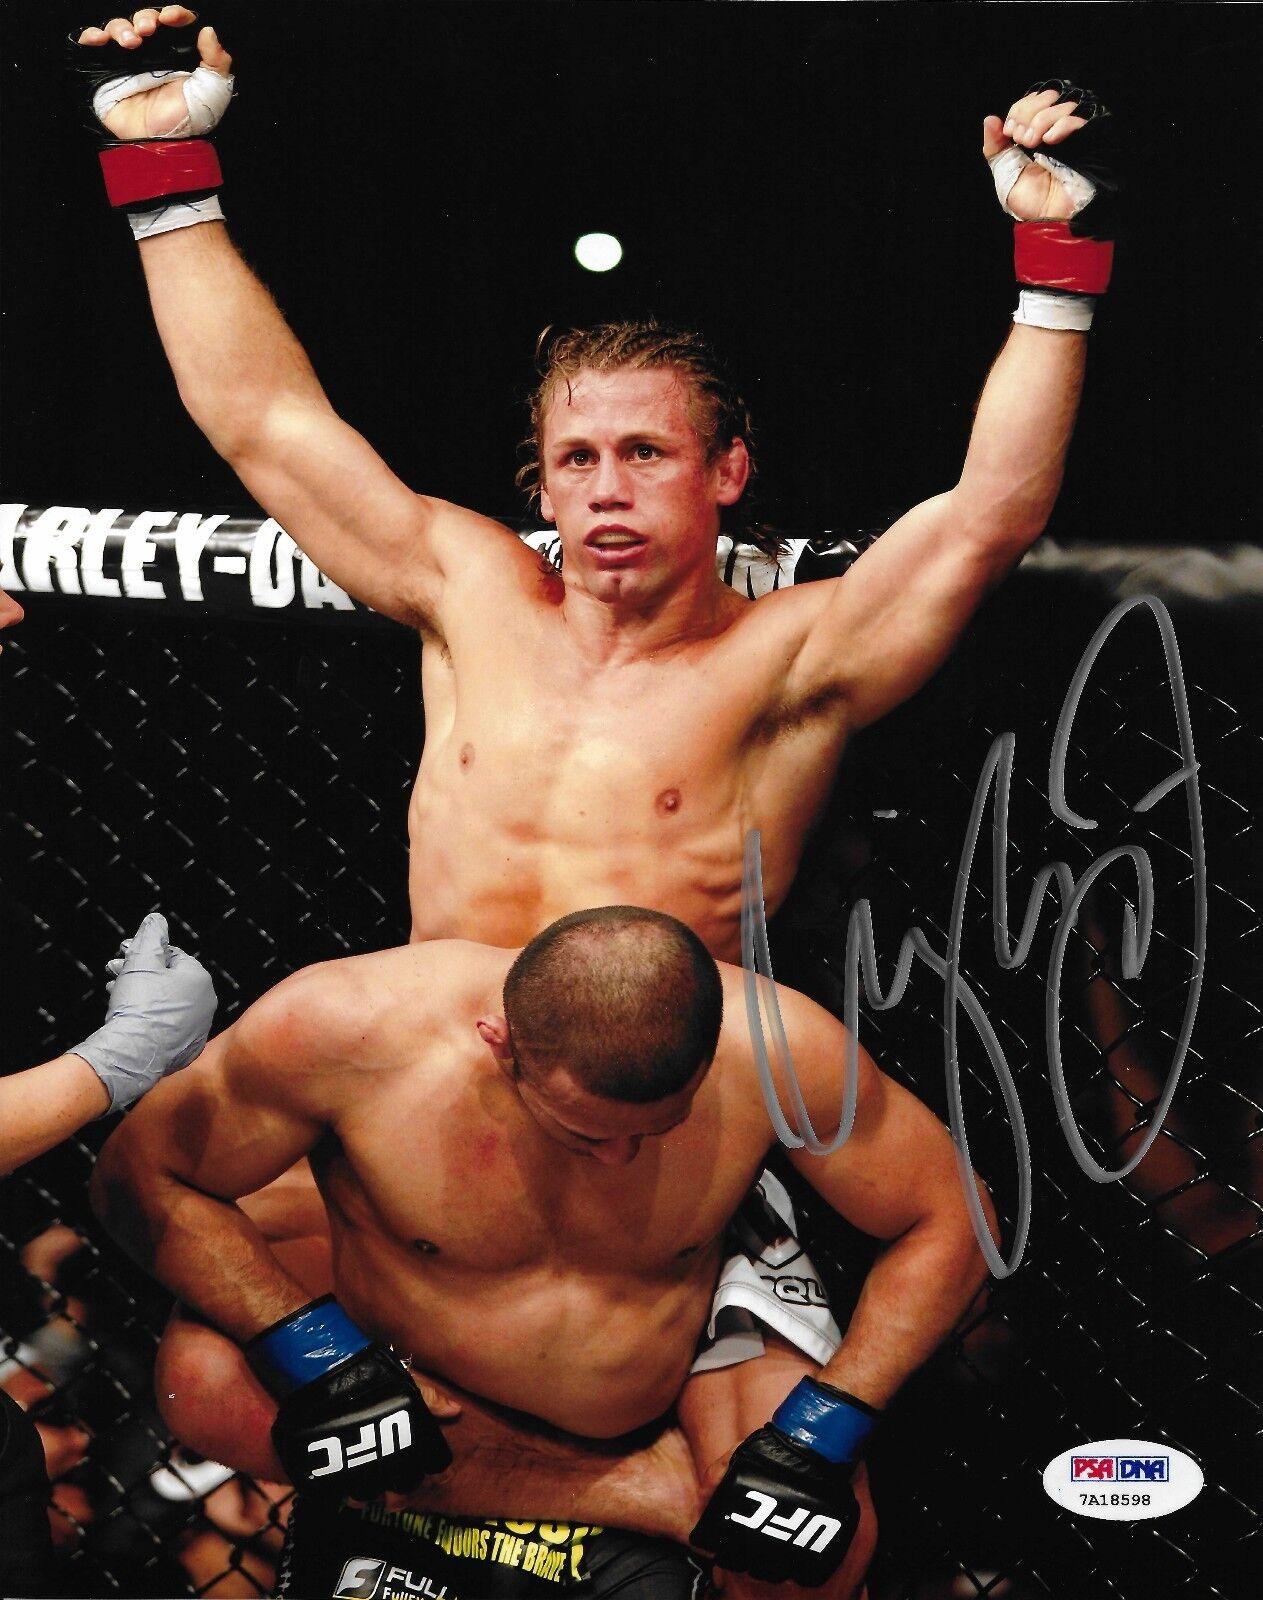 Urijah Faber Signé UFC 157 8x10 Photo PSA   DNA COA Wec Image Autographe 128 194